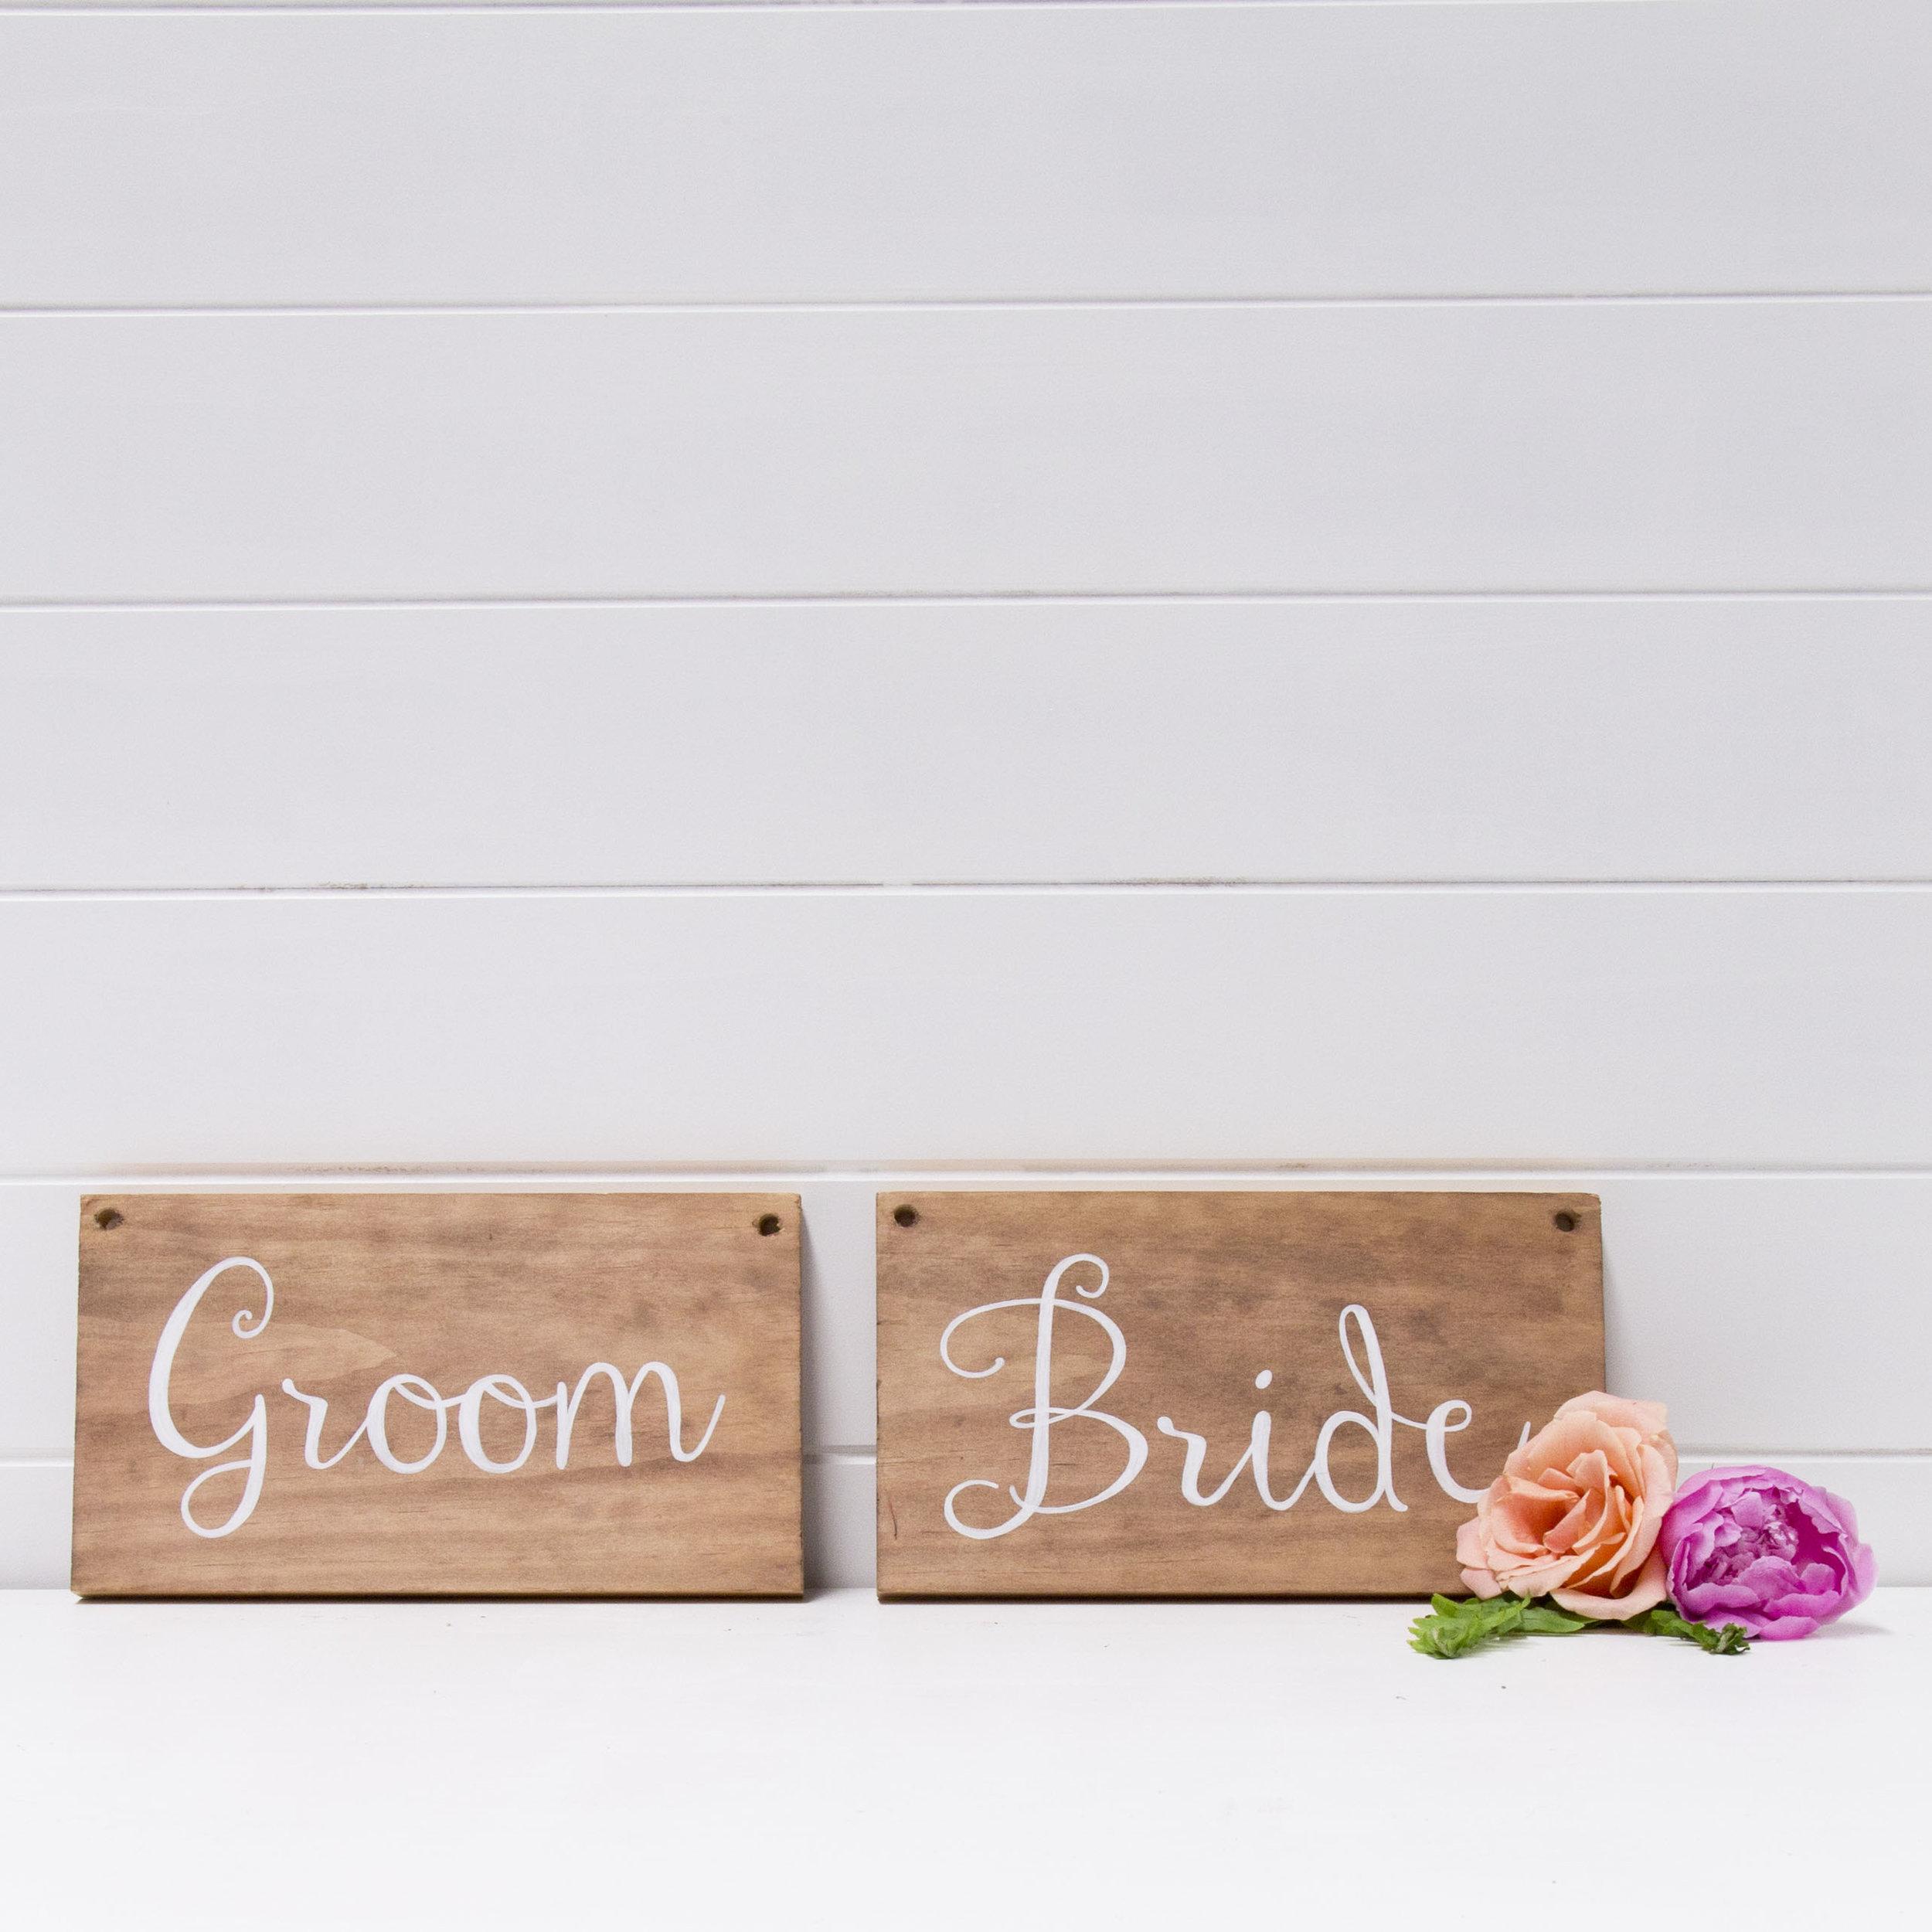 BRIDE & GROOM WOODEN CHAIR SIGNS